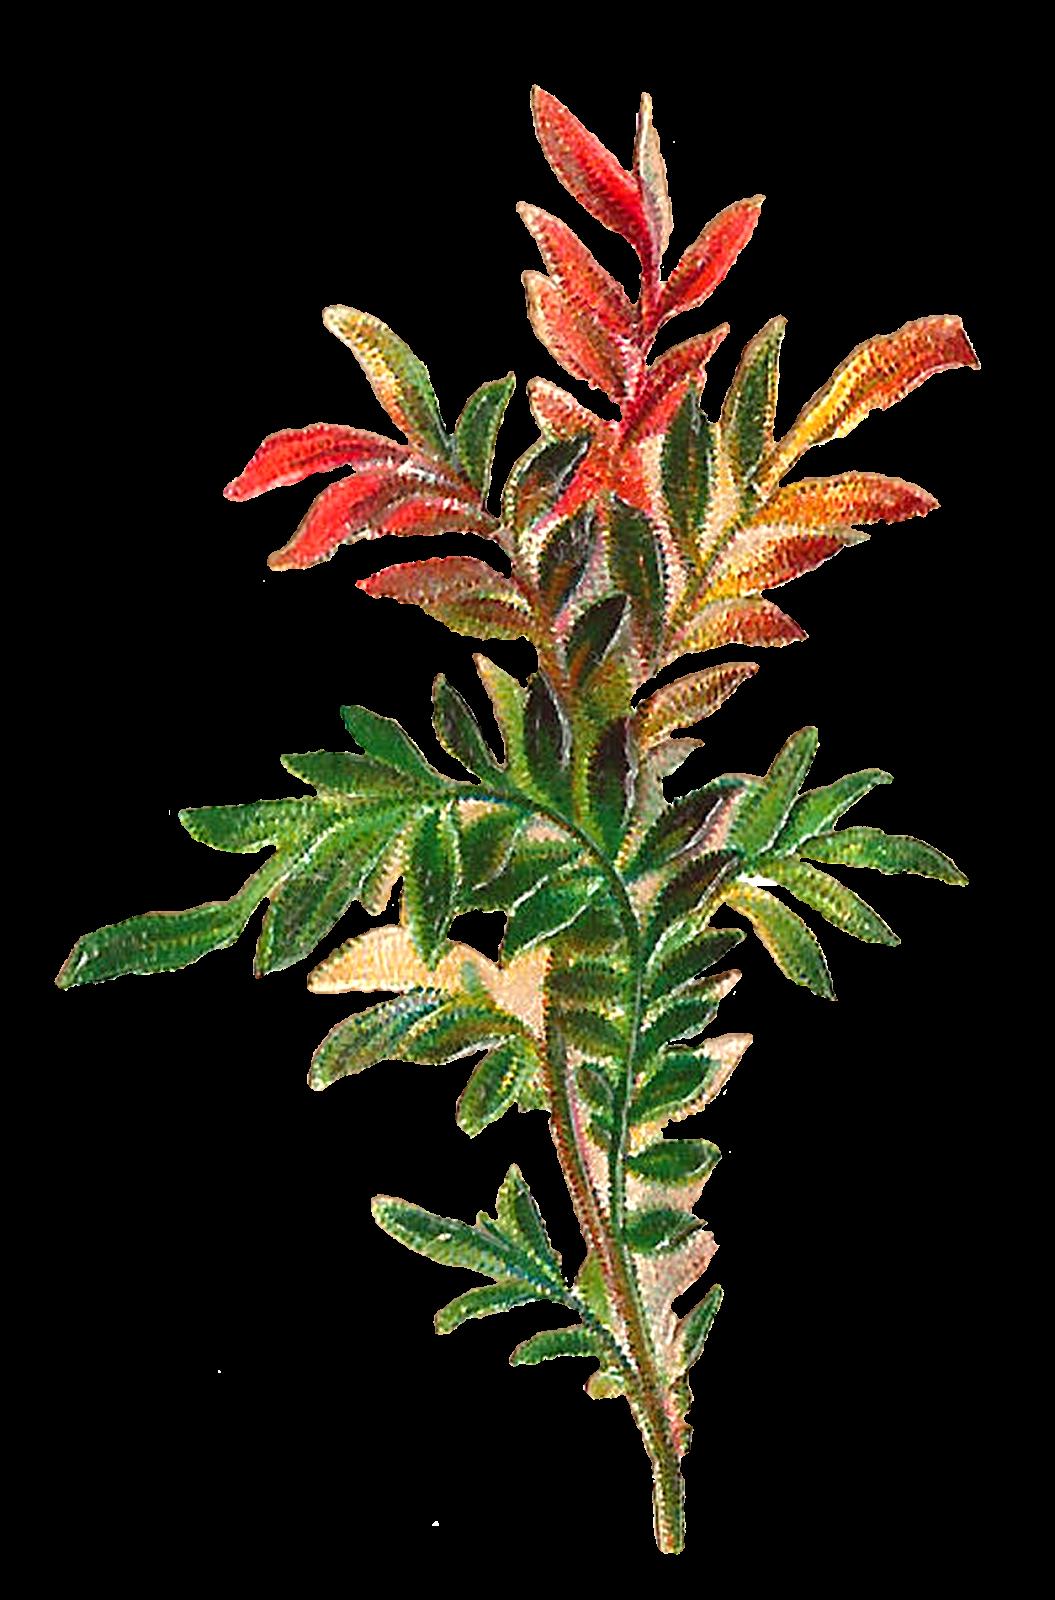 1055x1600 Antique Images Forest Plant Leaves Botanical Antique Artwork